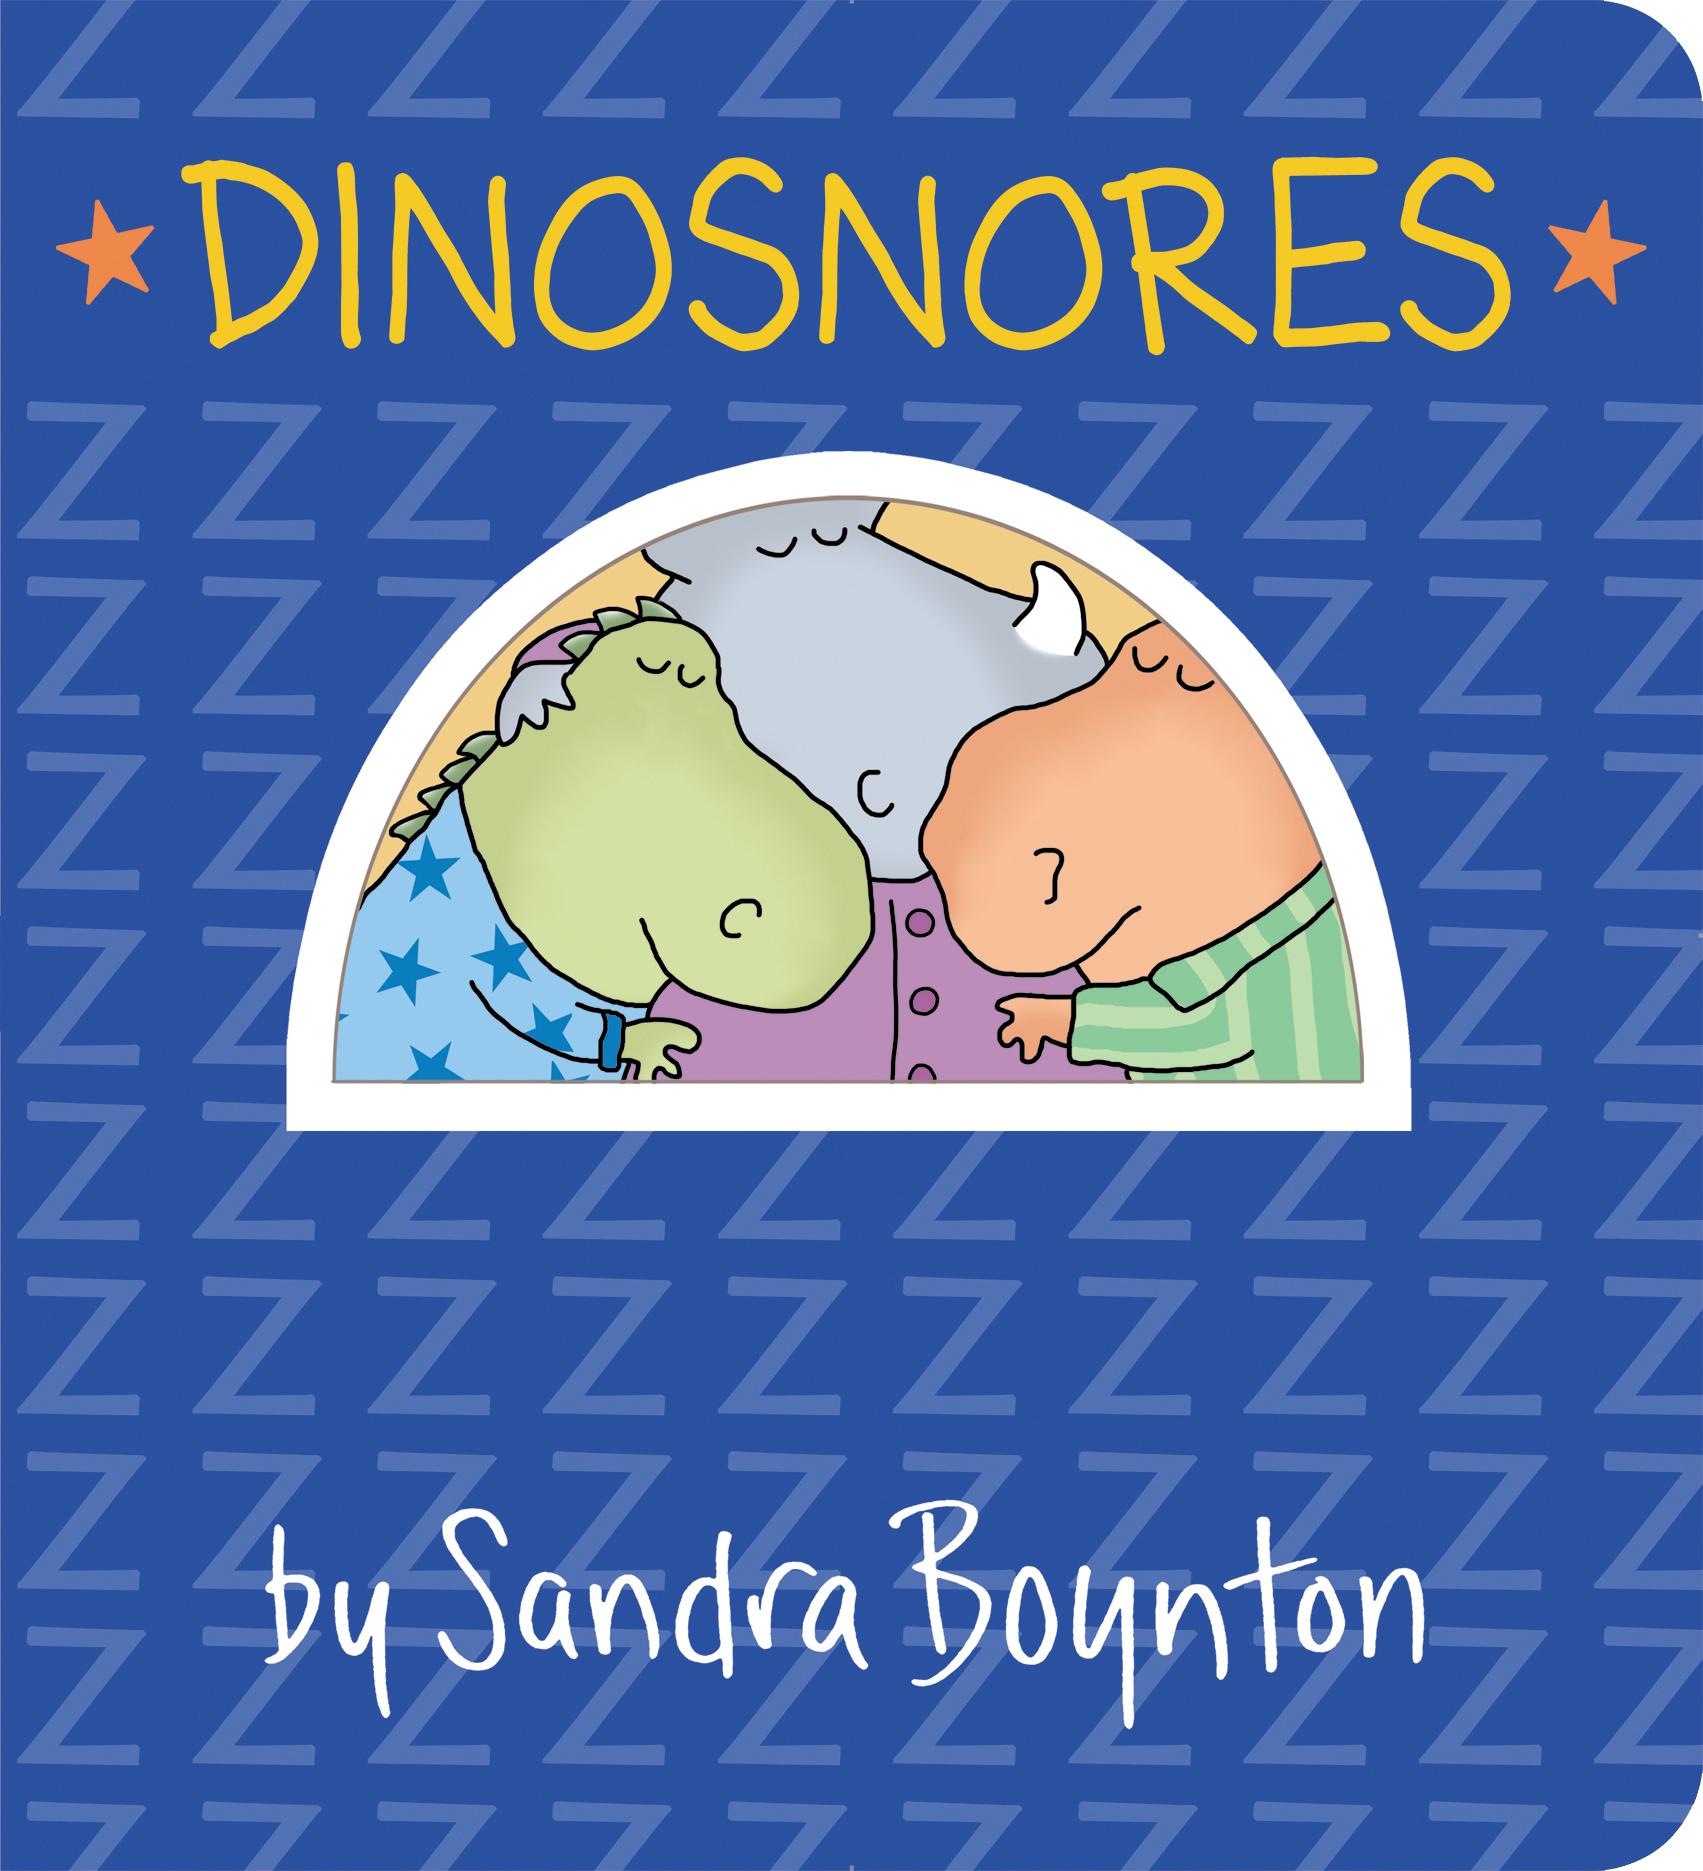 Dinosnores by Sandra Boynton 1